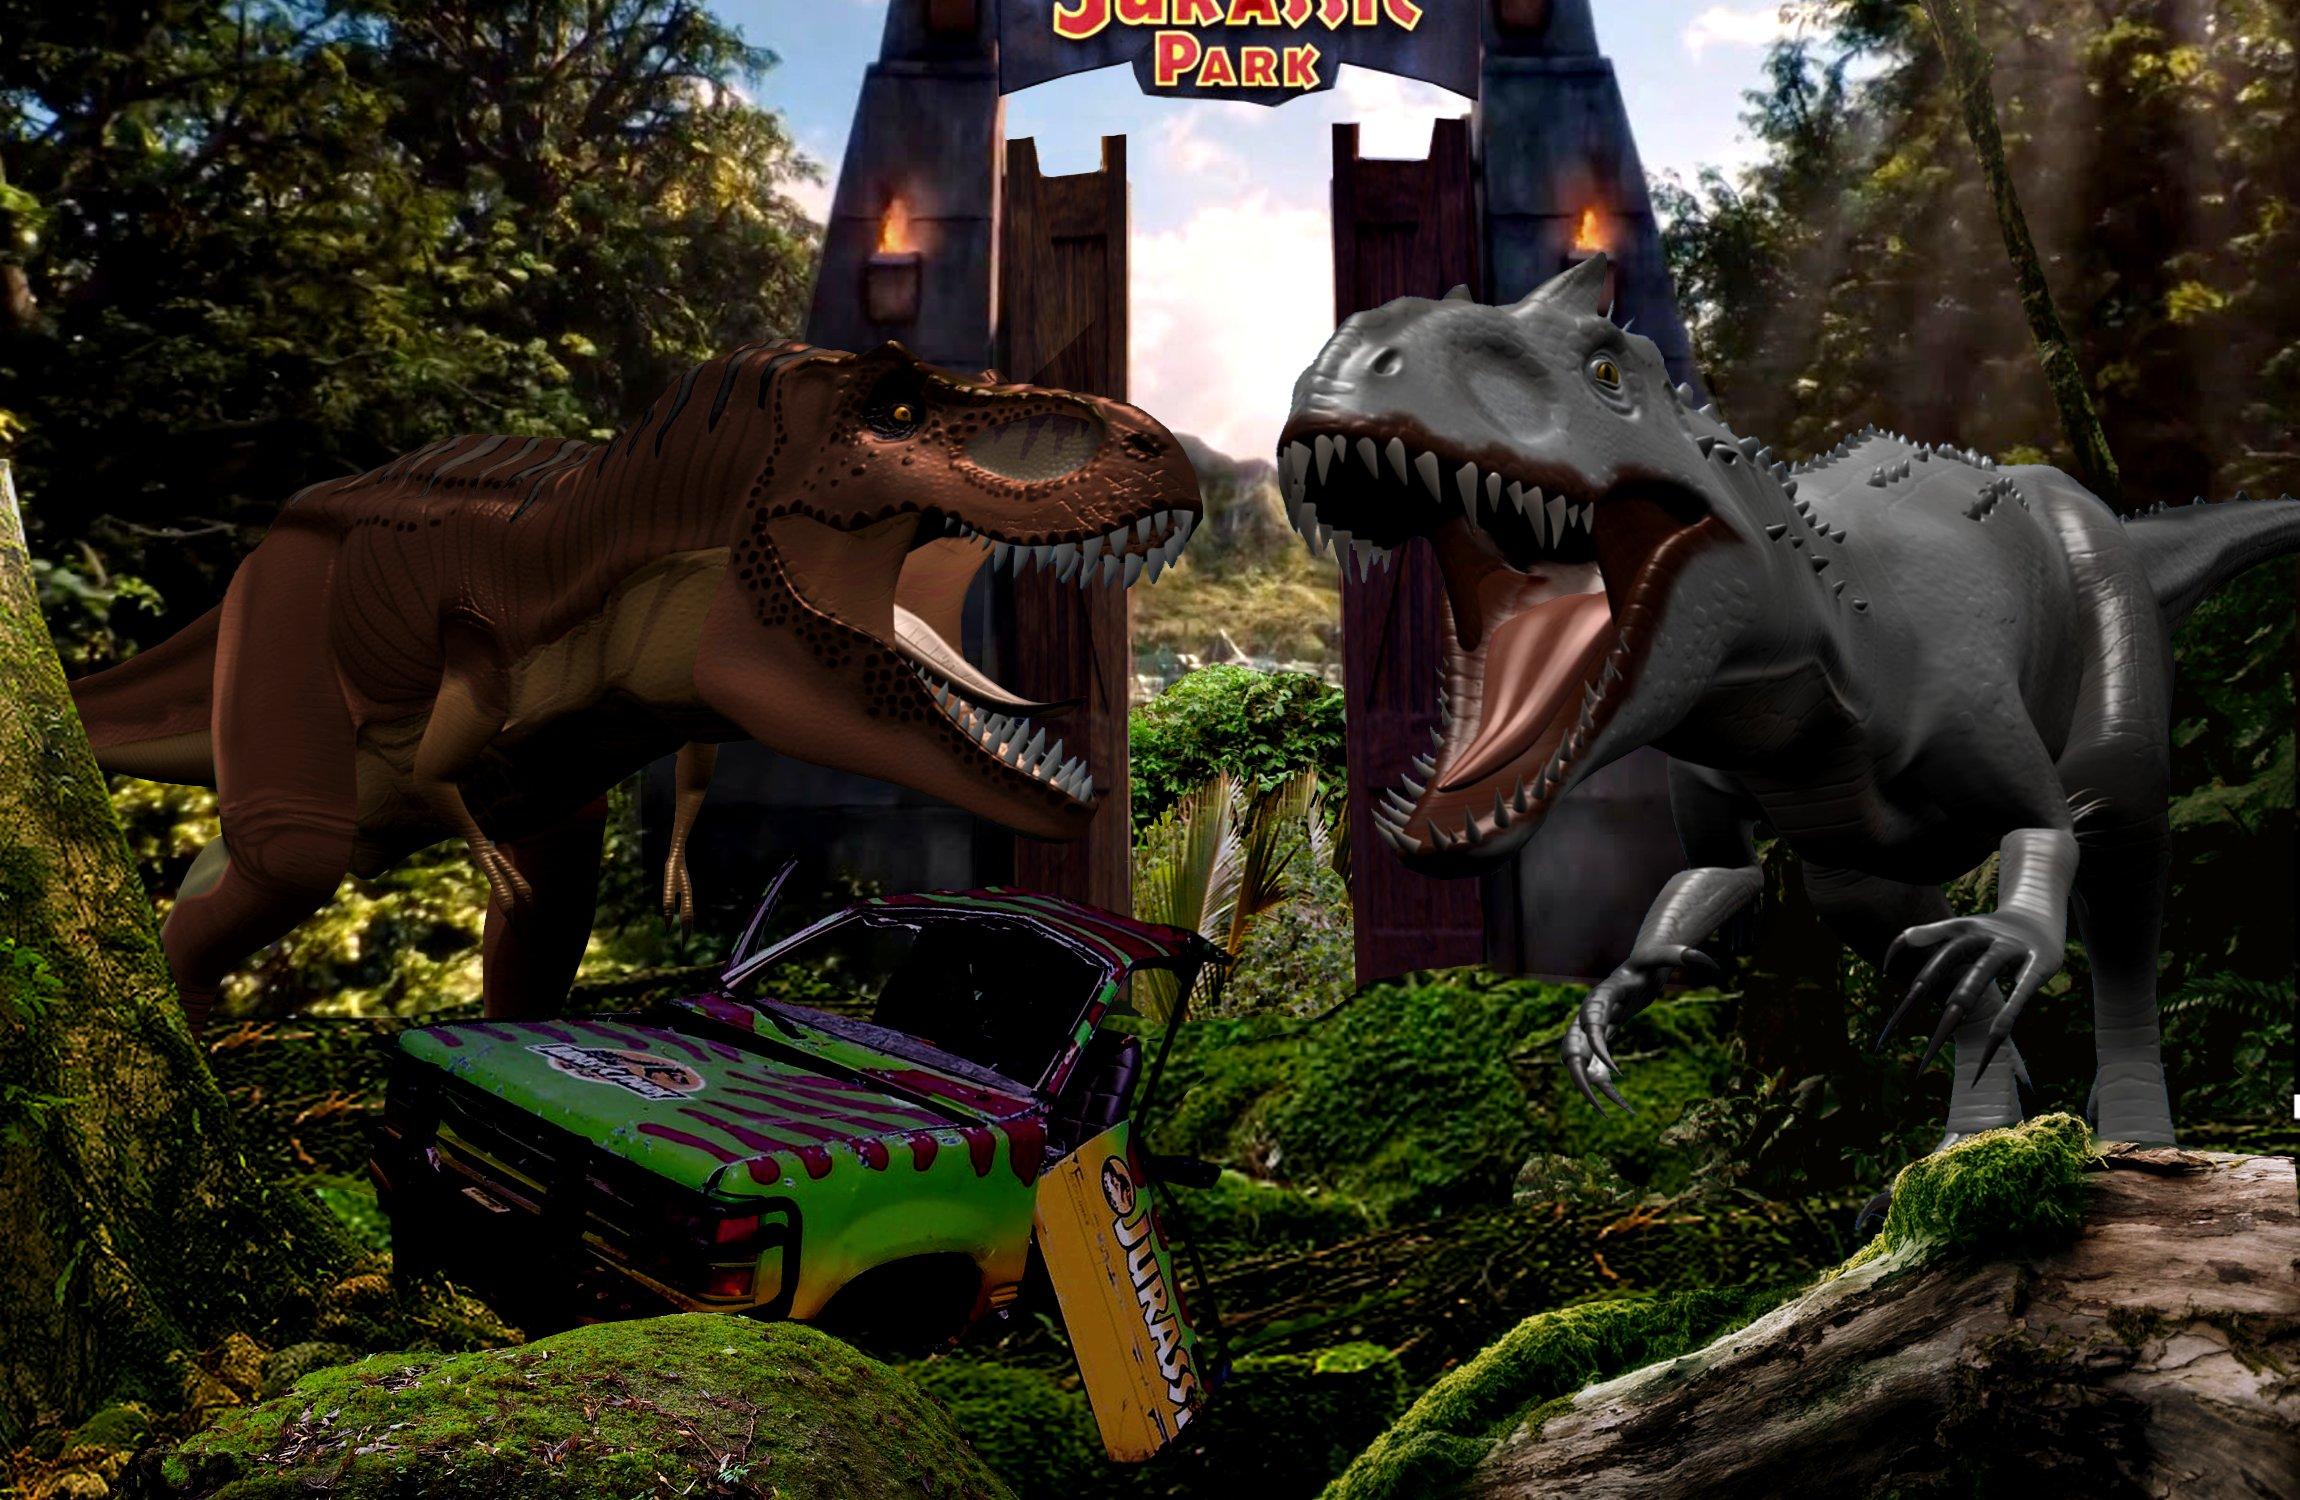 Wall Stickers Dinosaurs Tyrannosaurus Rex And Indominus Rex By Pepsilver On Deviantart